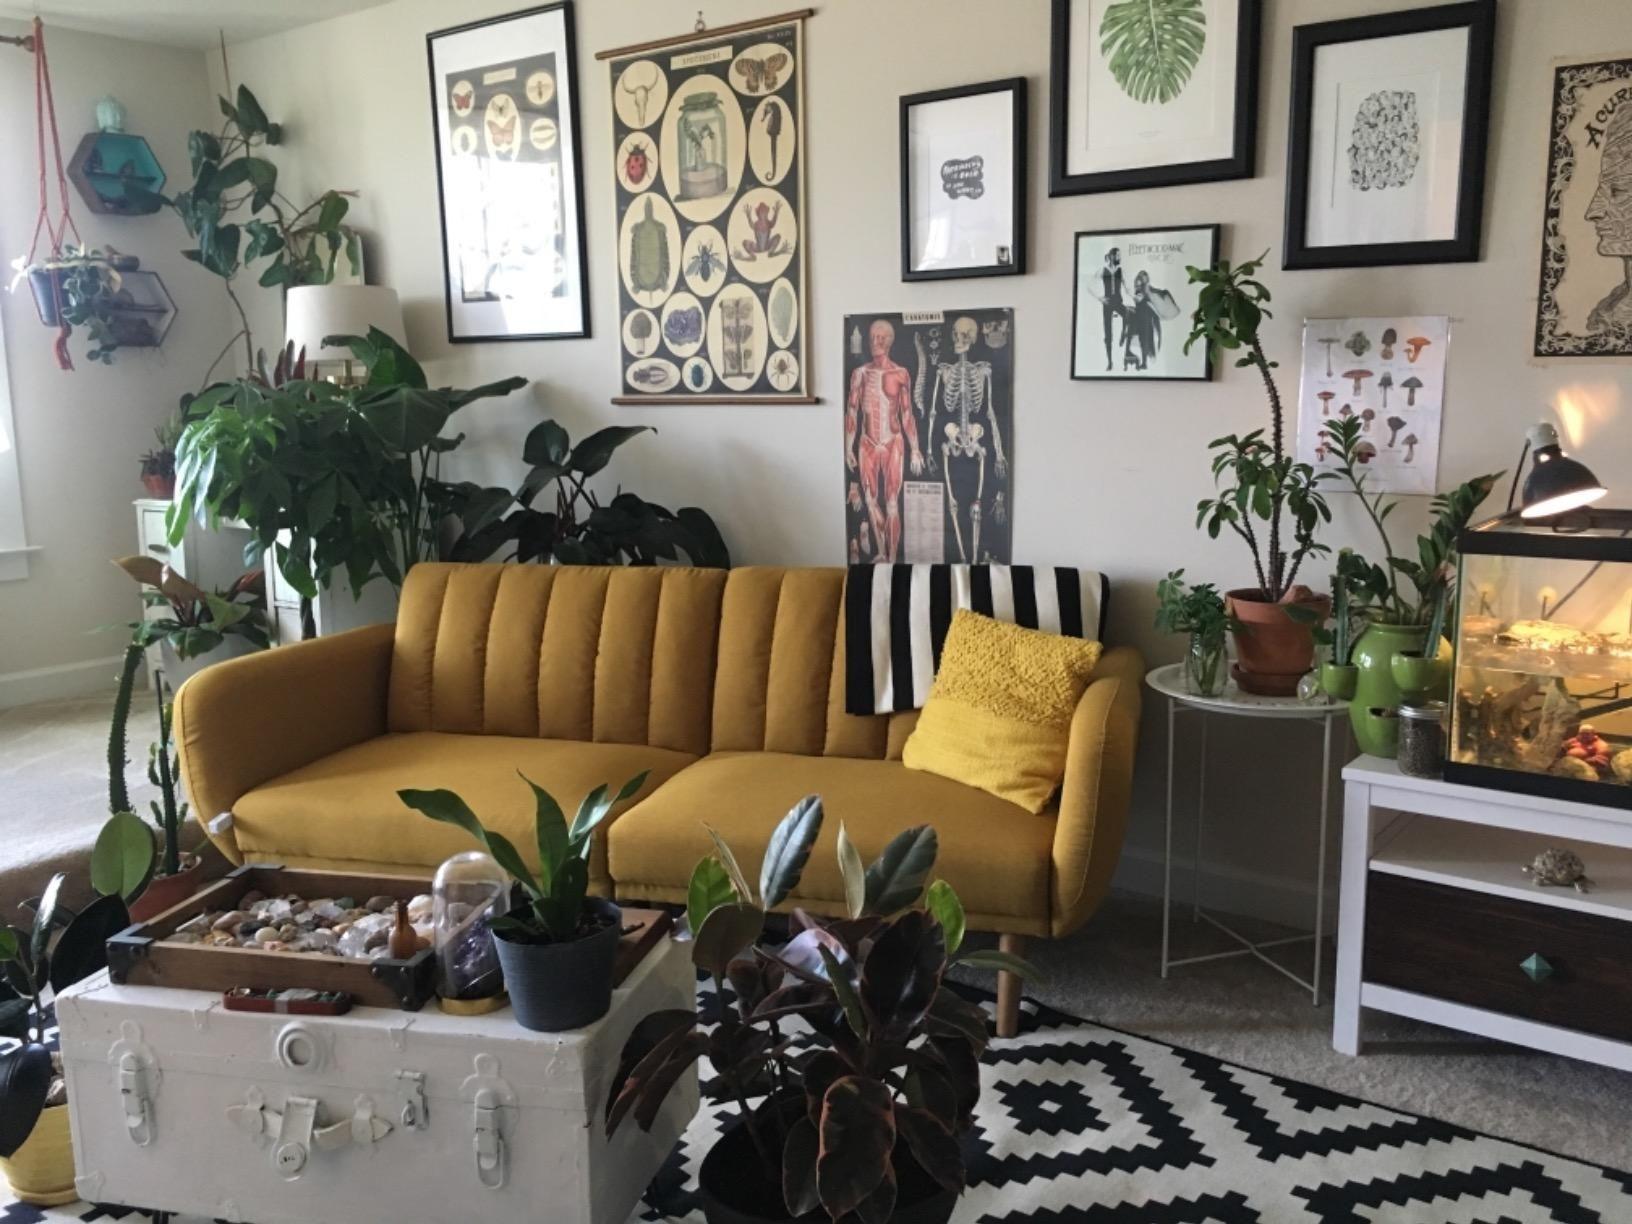 Amazon Com Novogratz Brittany Sofa Futon Premium Linen Upholstery And Wooden Legs Mustard Linen Kitchen Futon Sofa Cozy Reading Corners Linen Upholstery